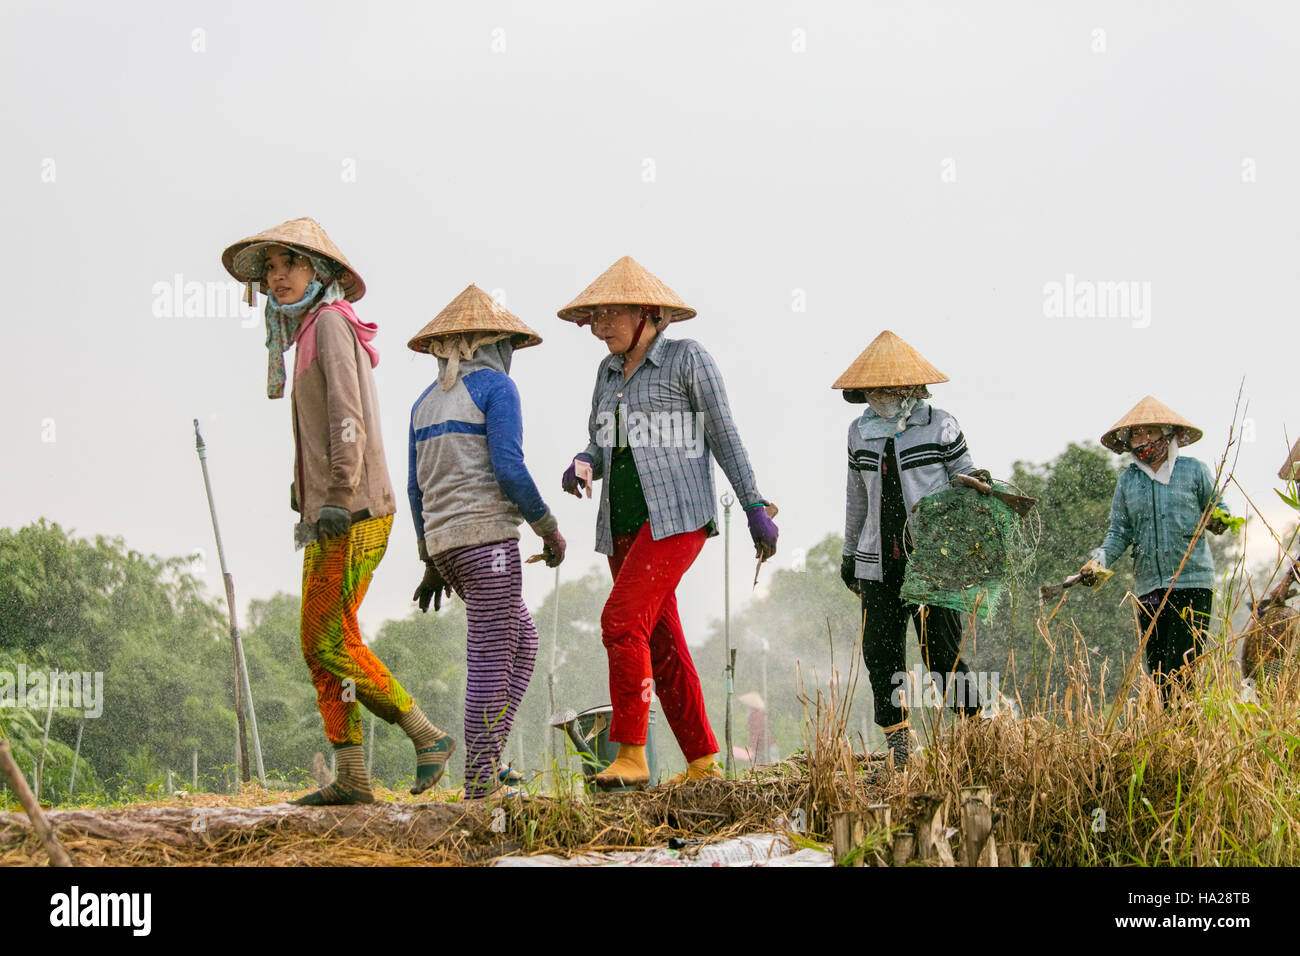 Ma Un Hung, village agricole, Mekong, Vietnam, Asie Photo Stock